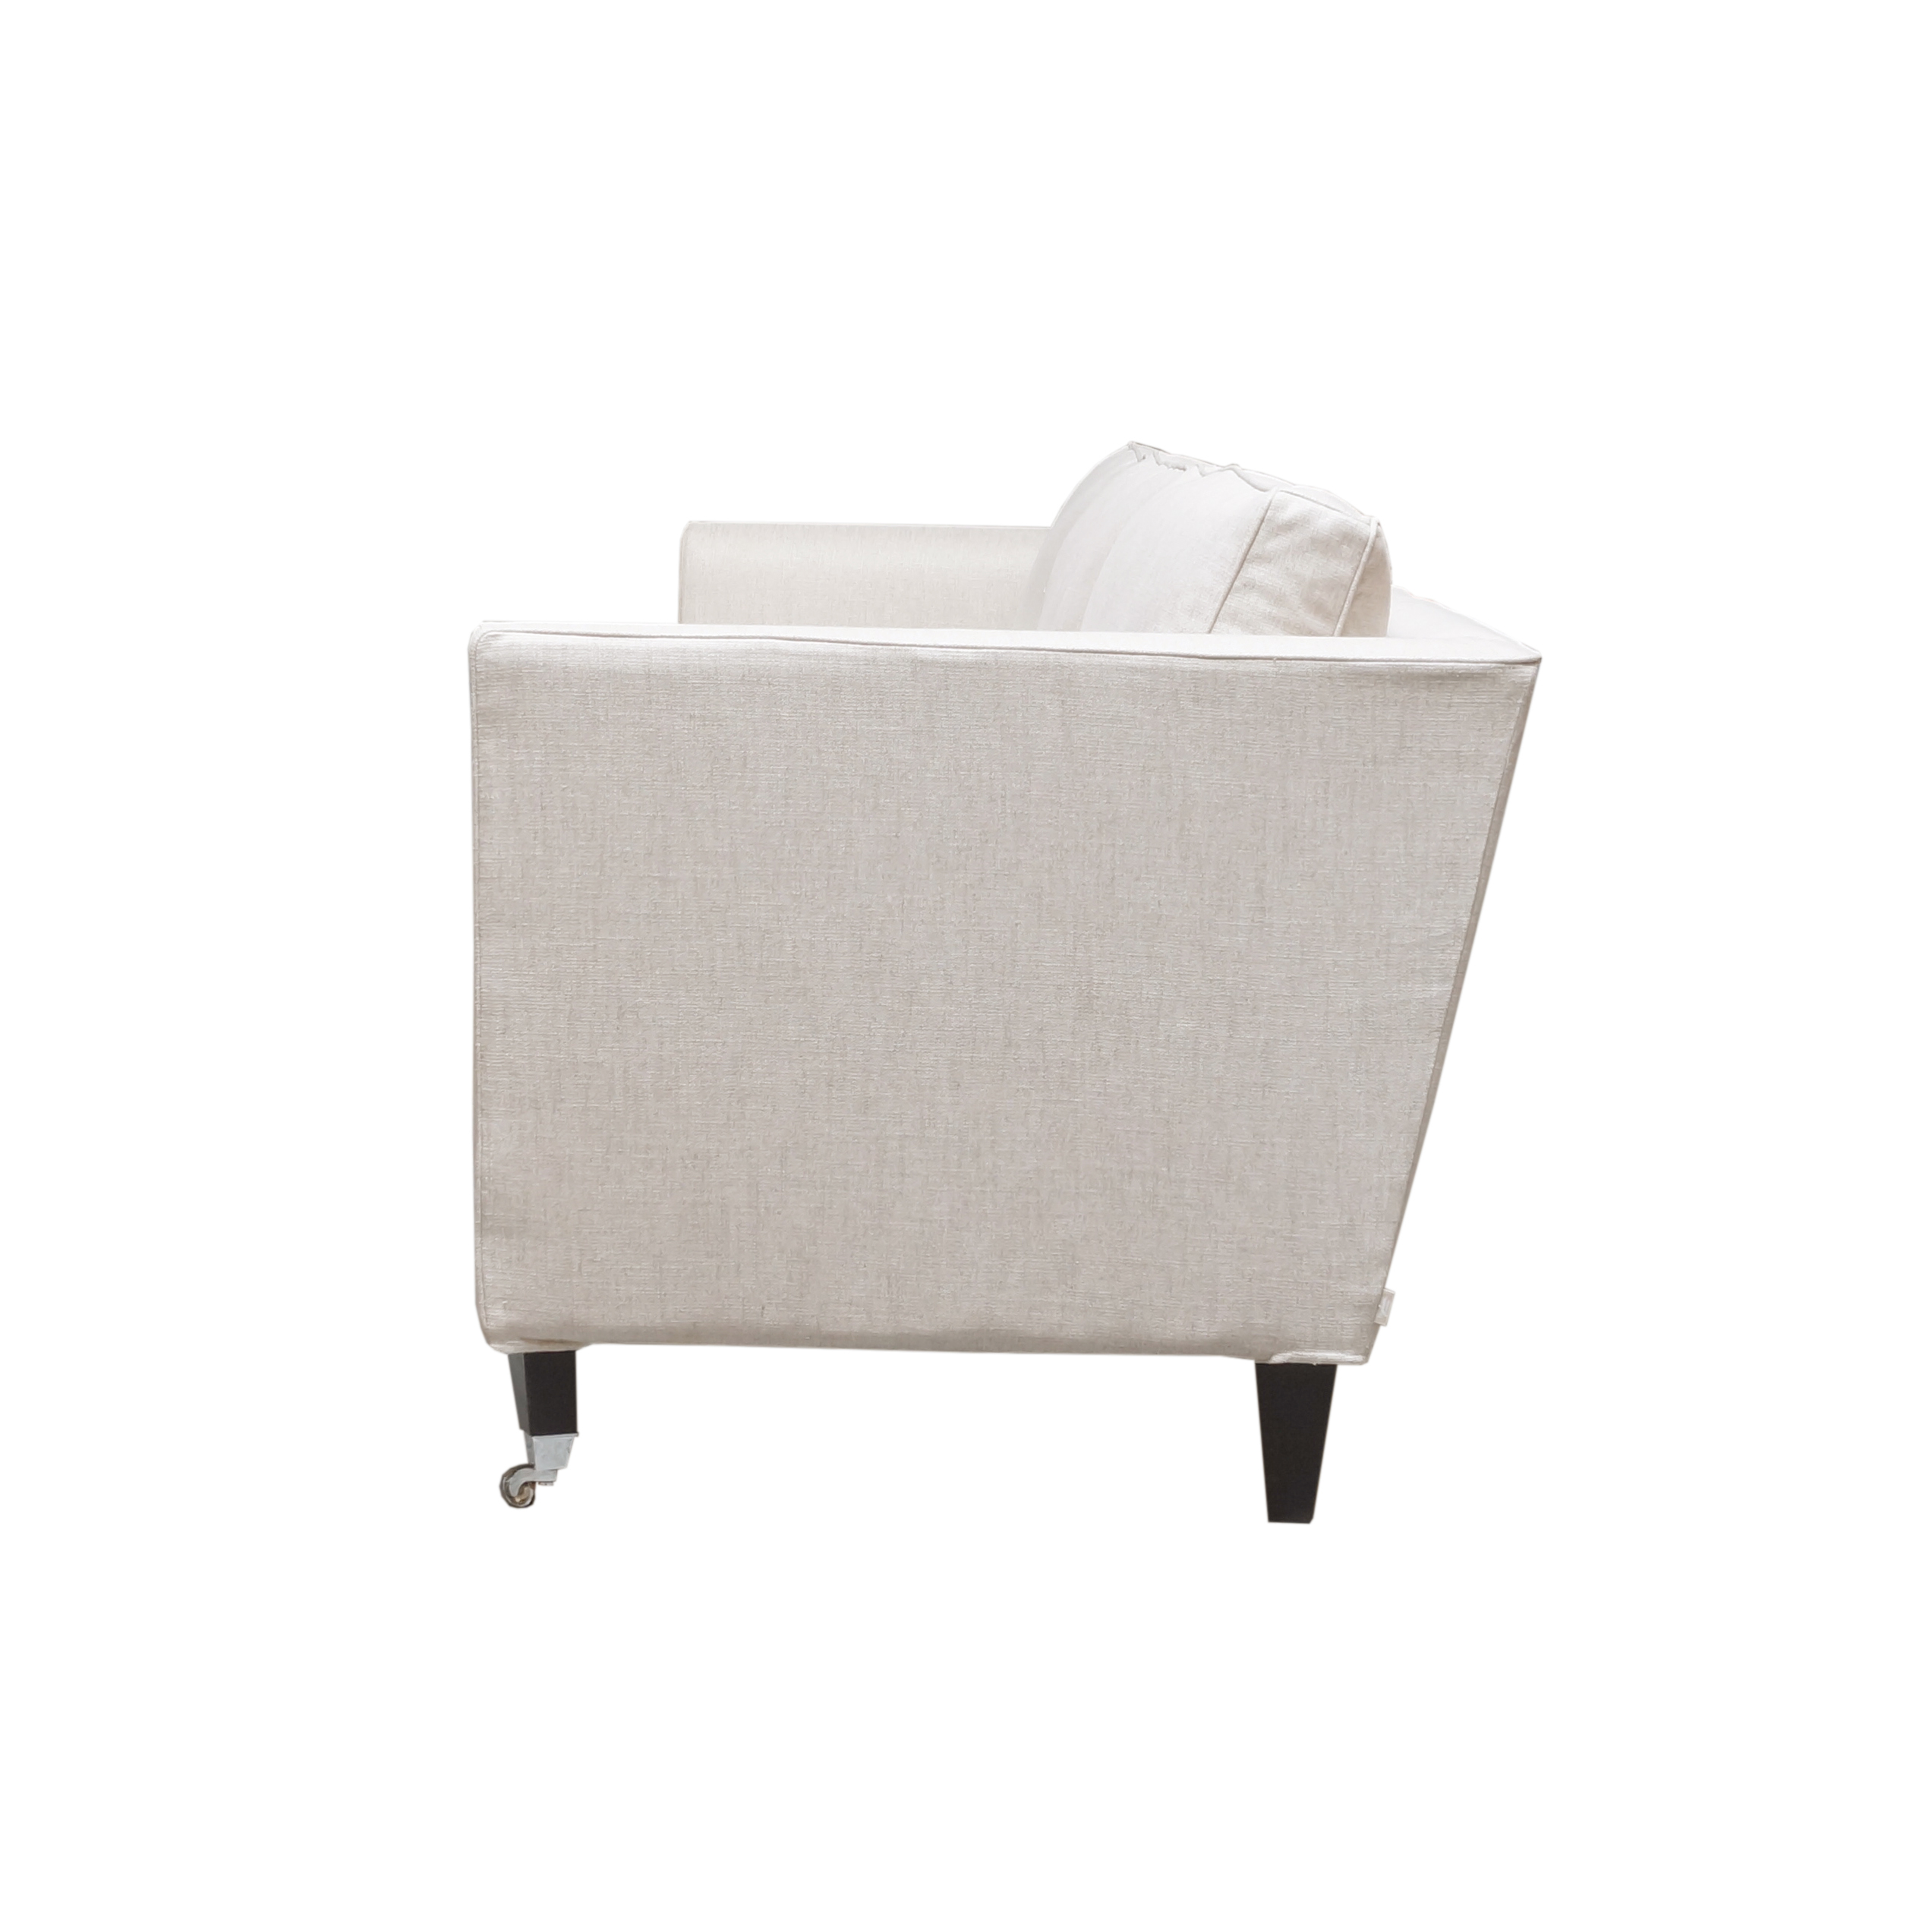 Carlton soffa 4-sits från sidan - englesson.se